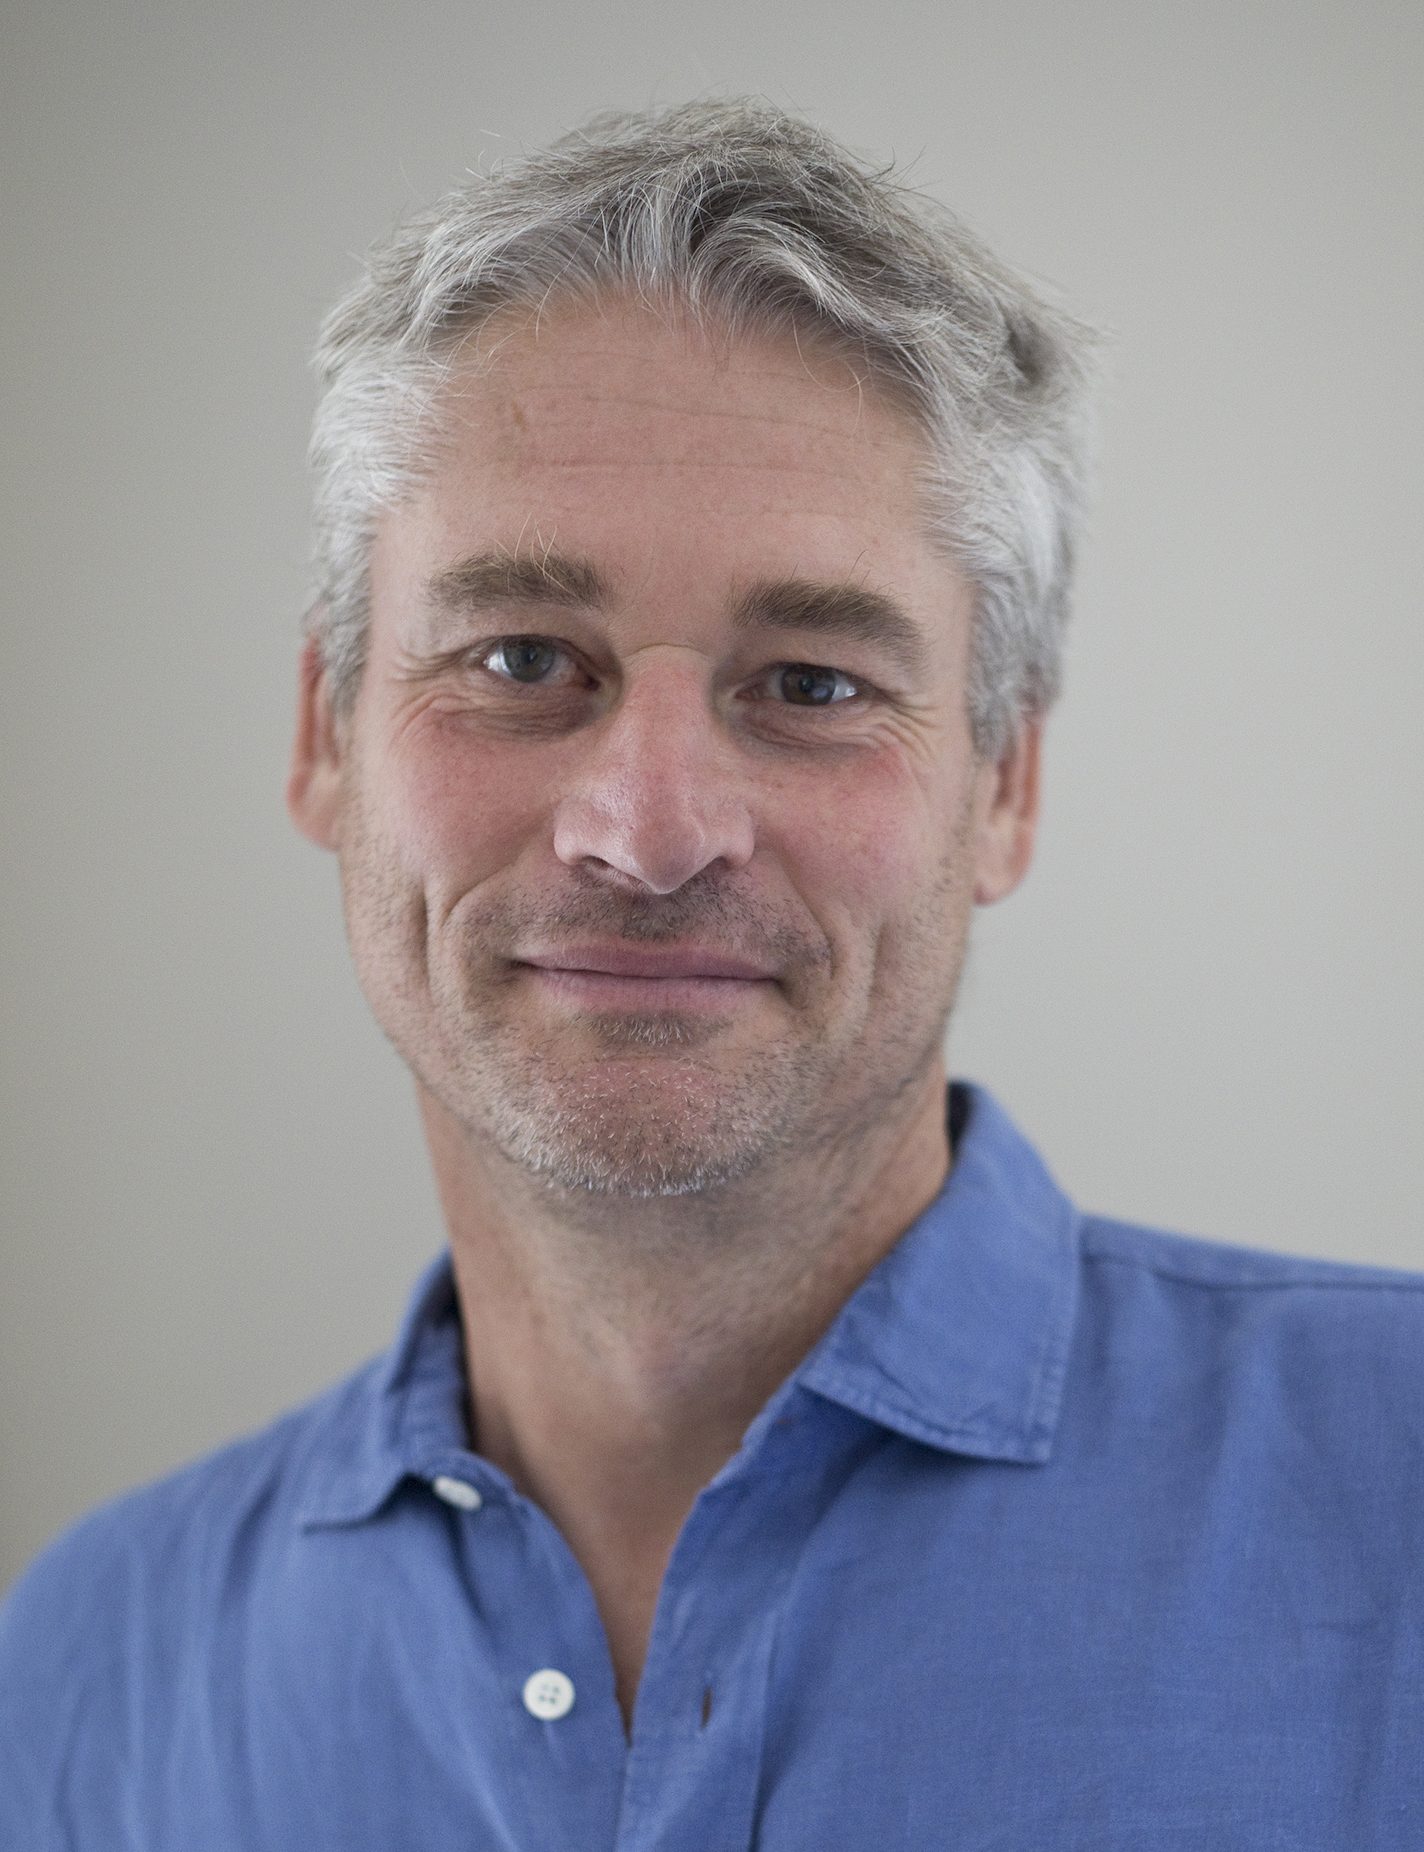 Simon Wilson Stephens